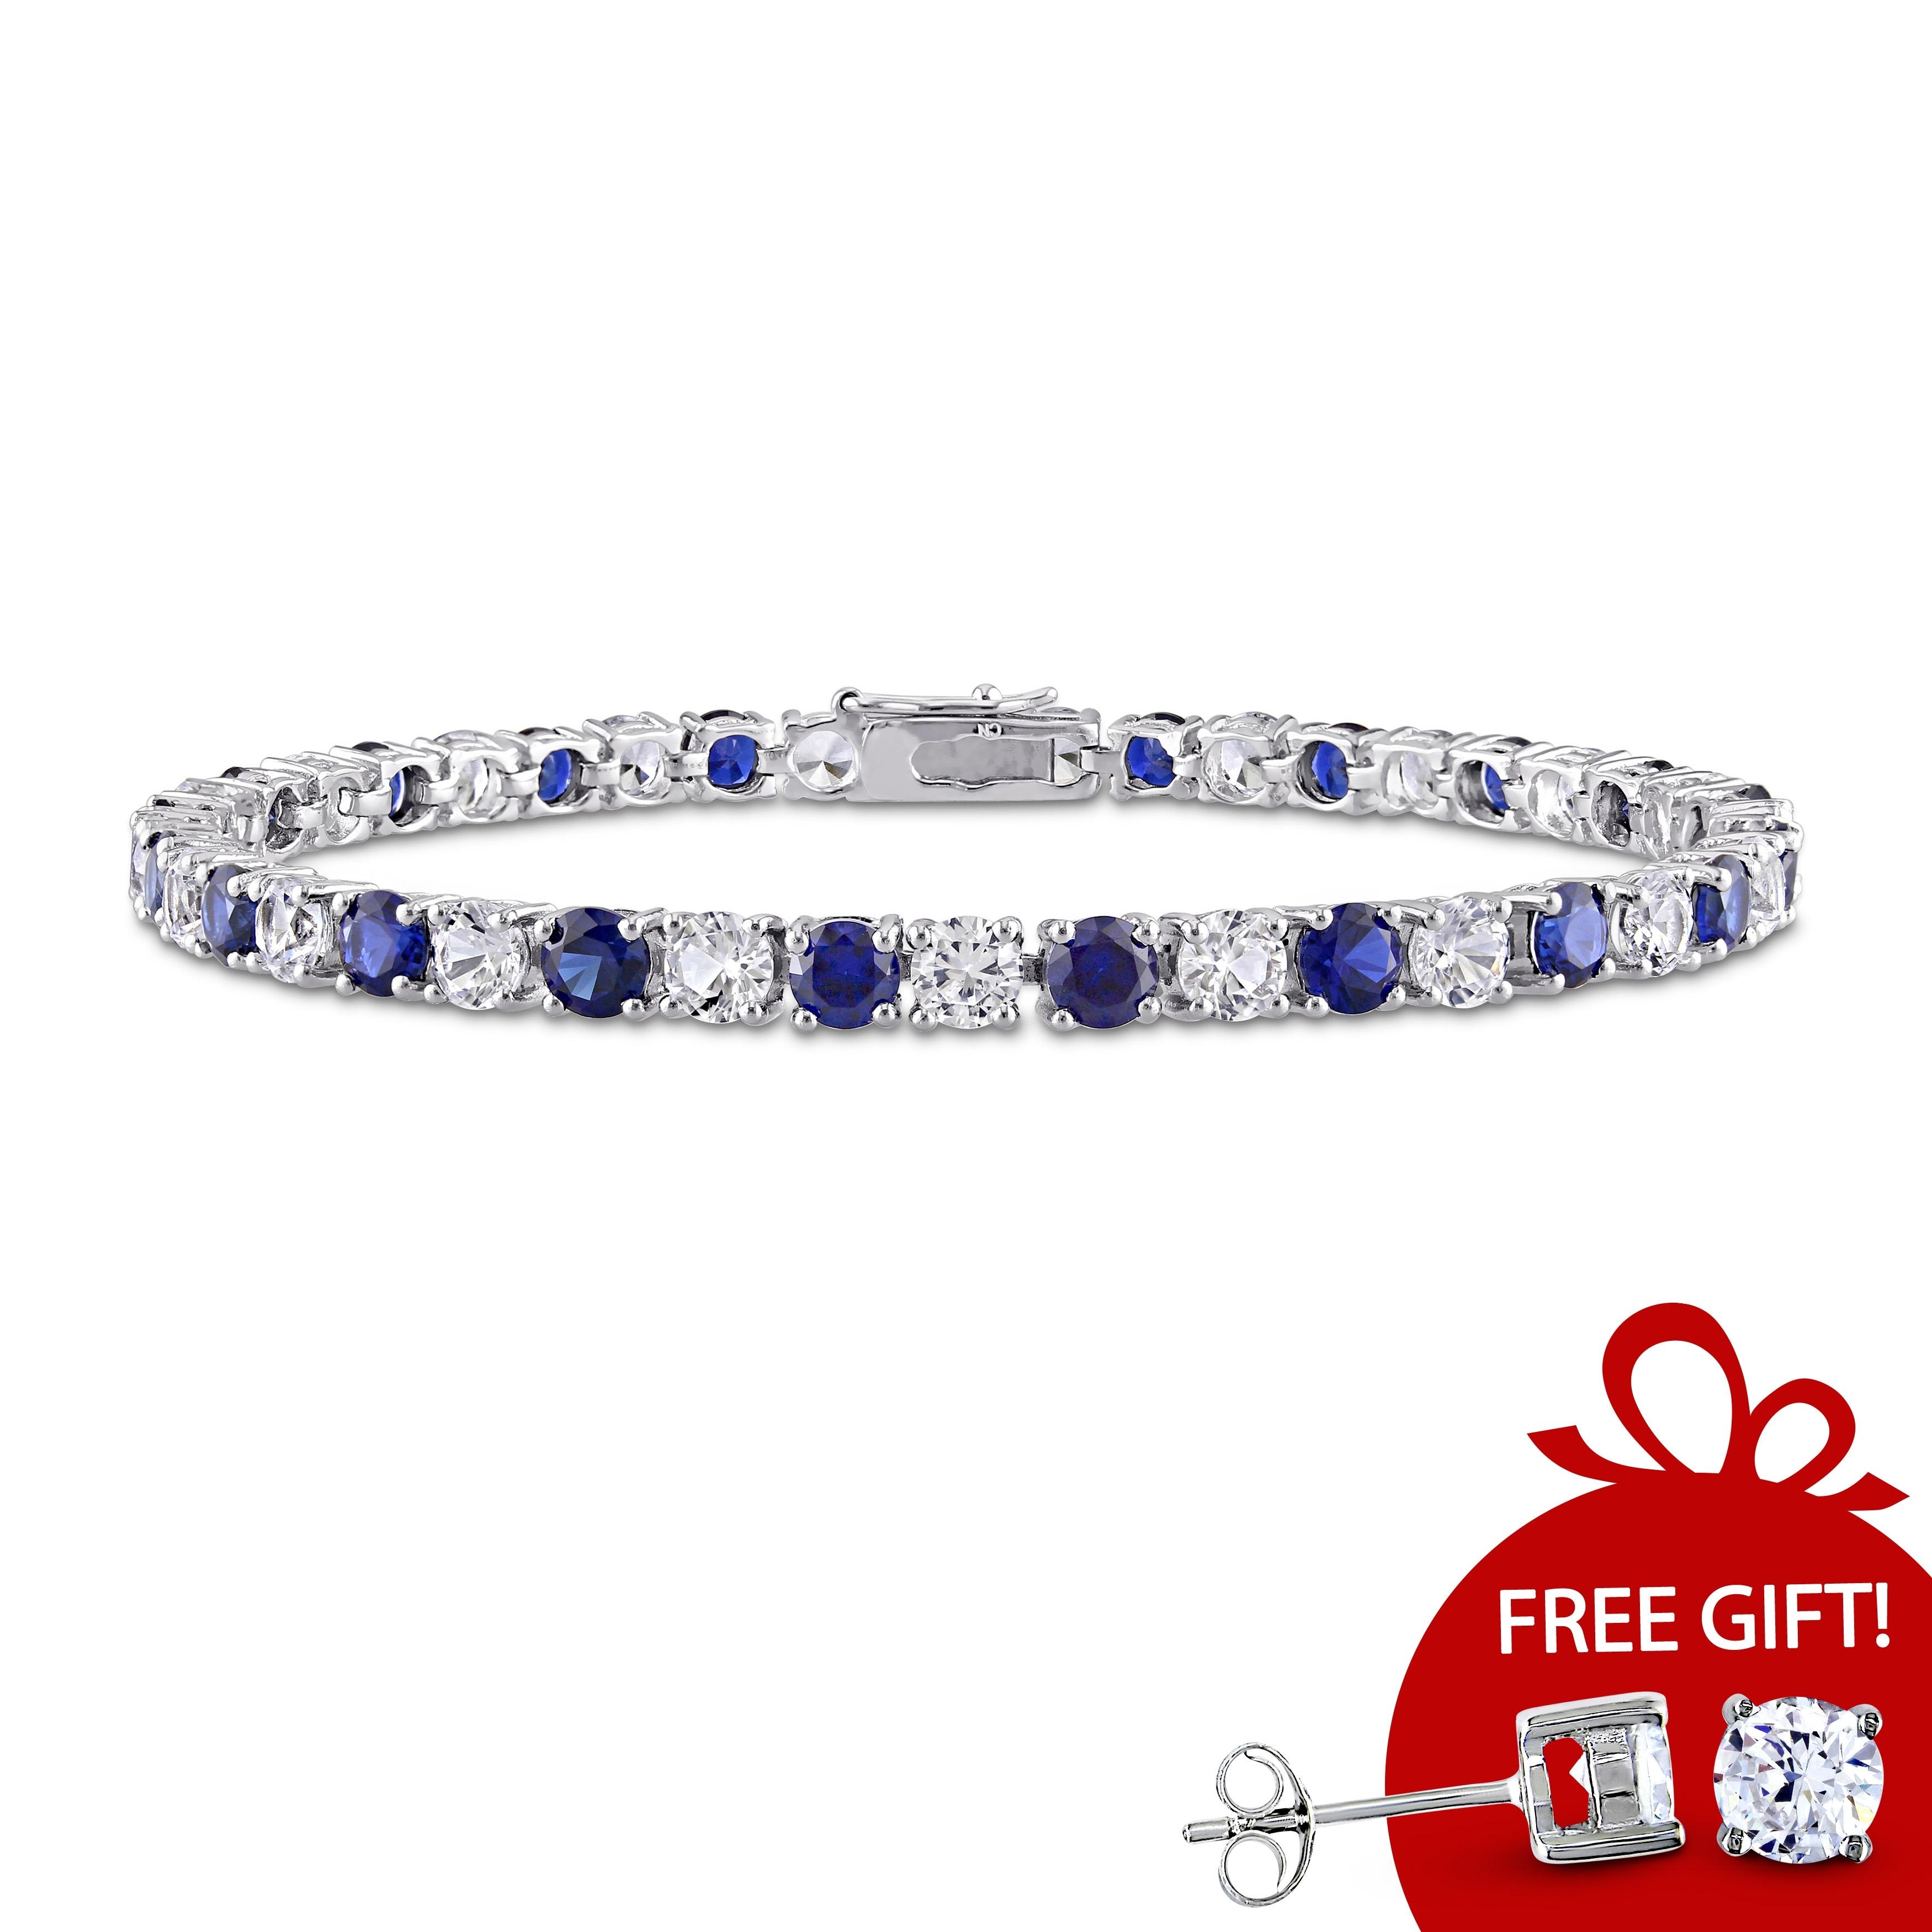 SAMPLE SALE Twinkle White Sapphire Charm Bracelet